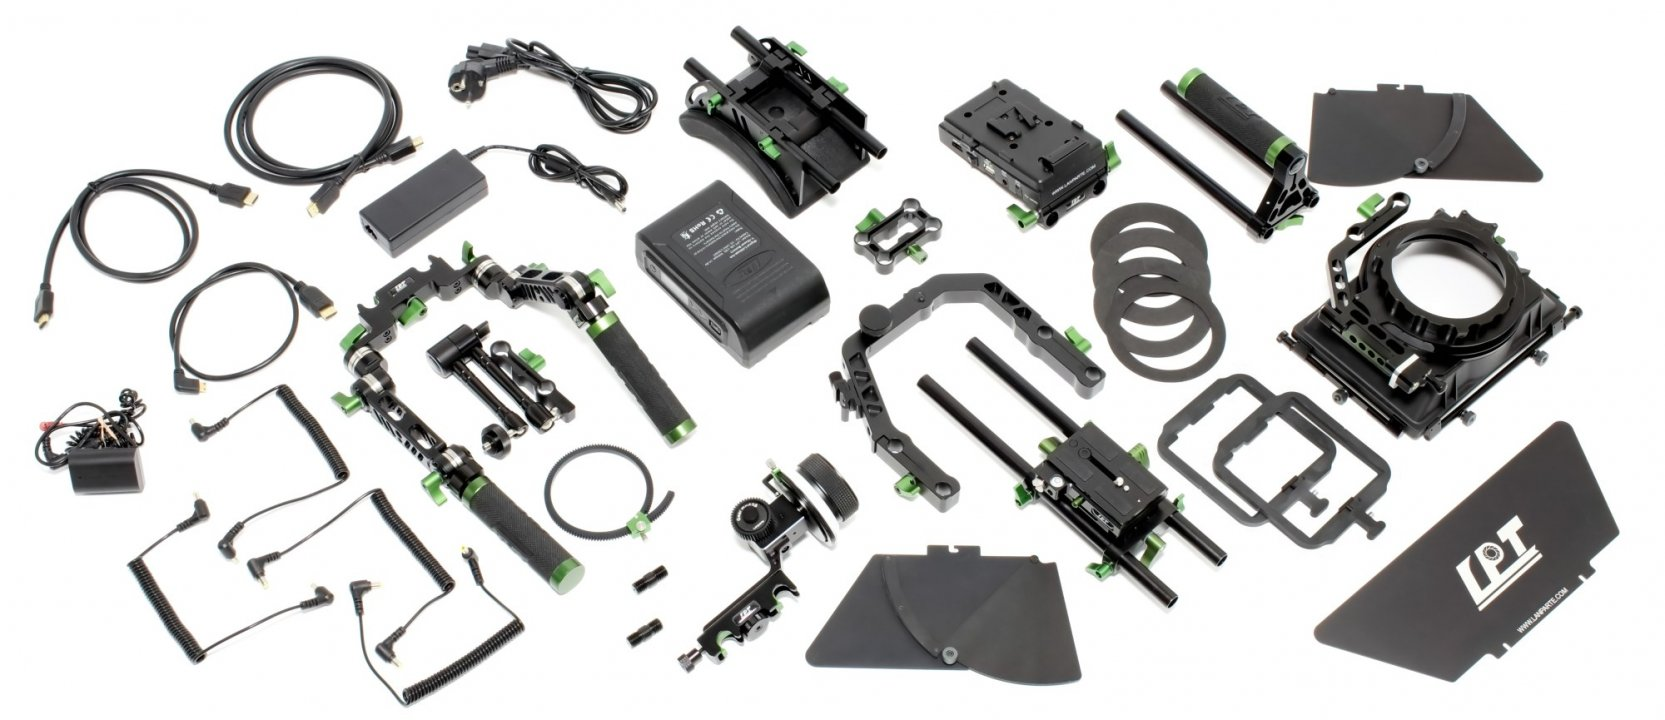 Lanparte PK-01 Professional Kit - Ultimatives DSLR und Camcorder Rig Foto Nr. 11